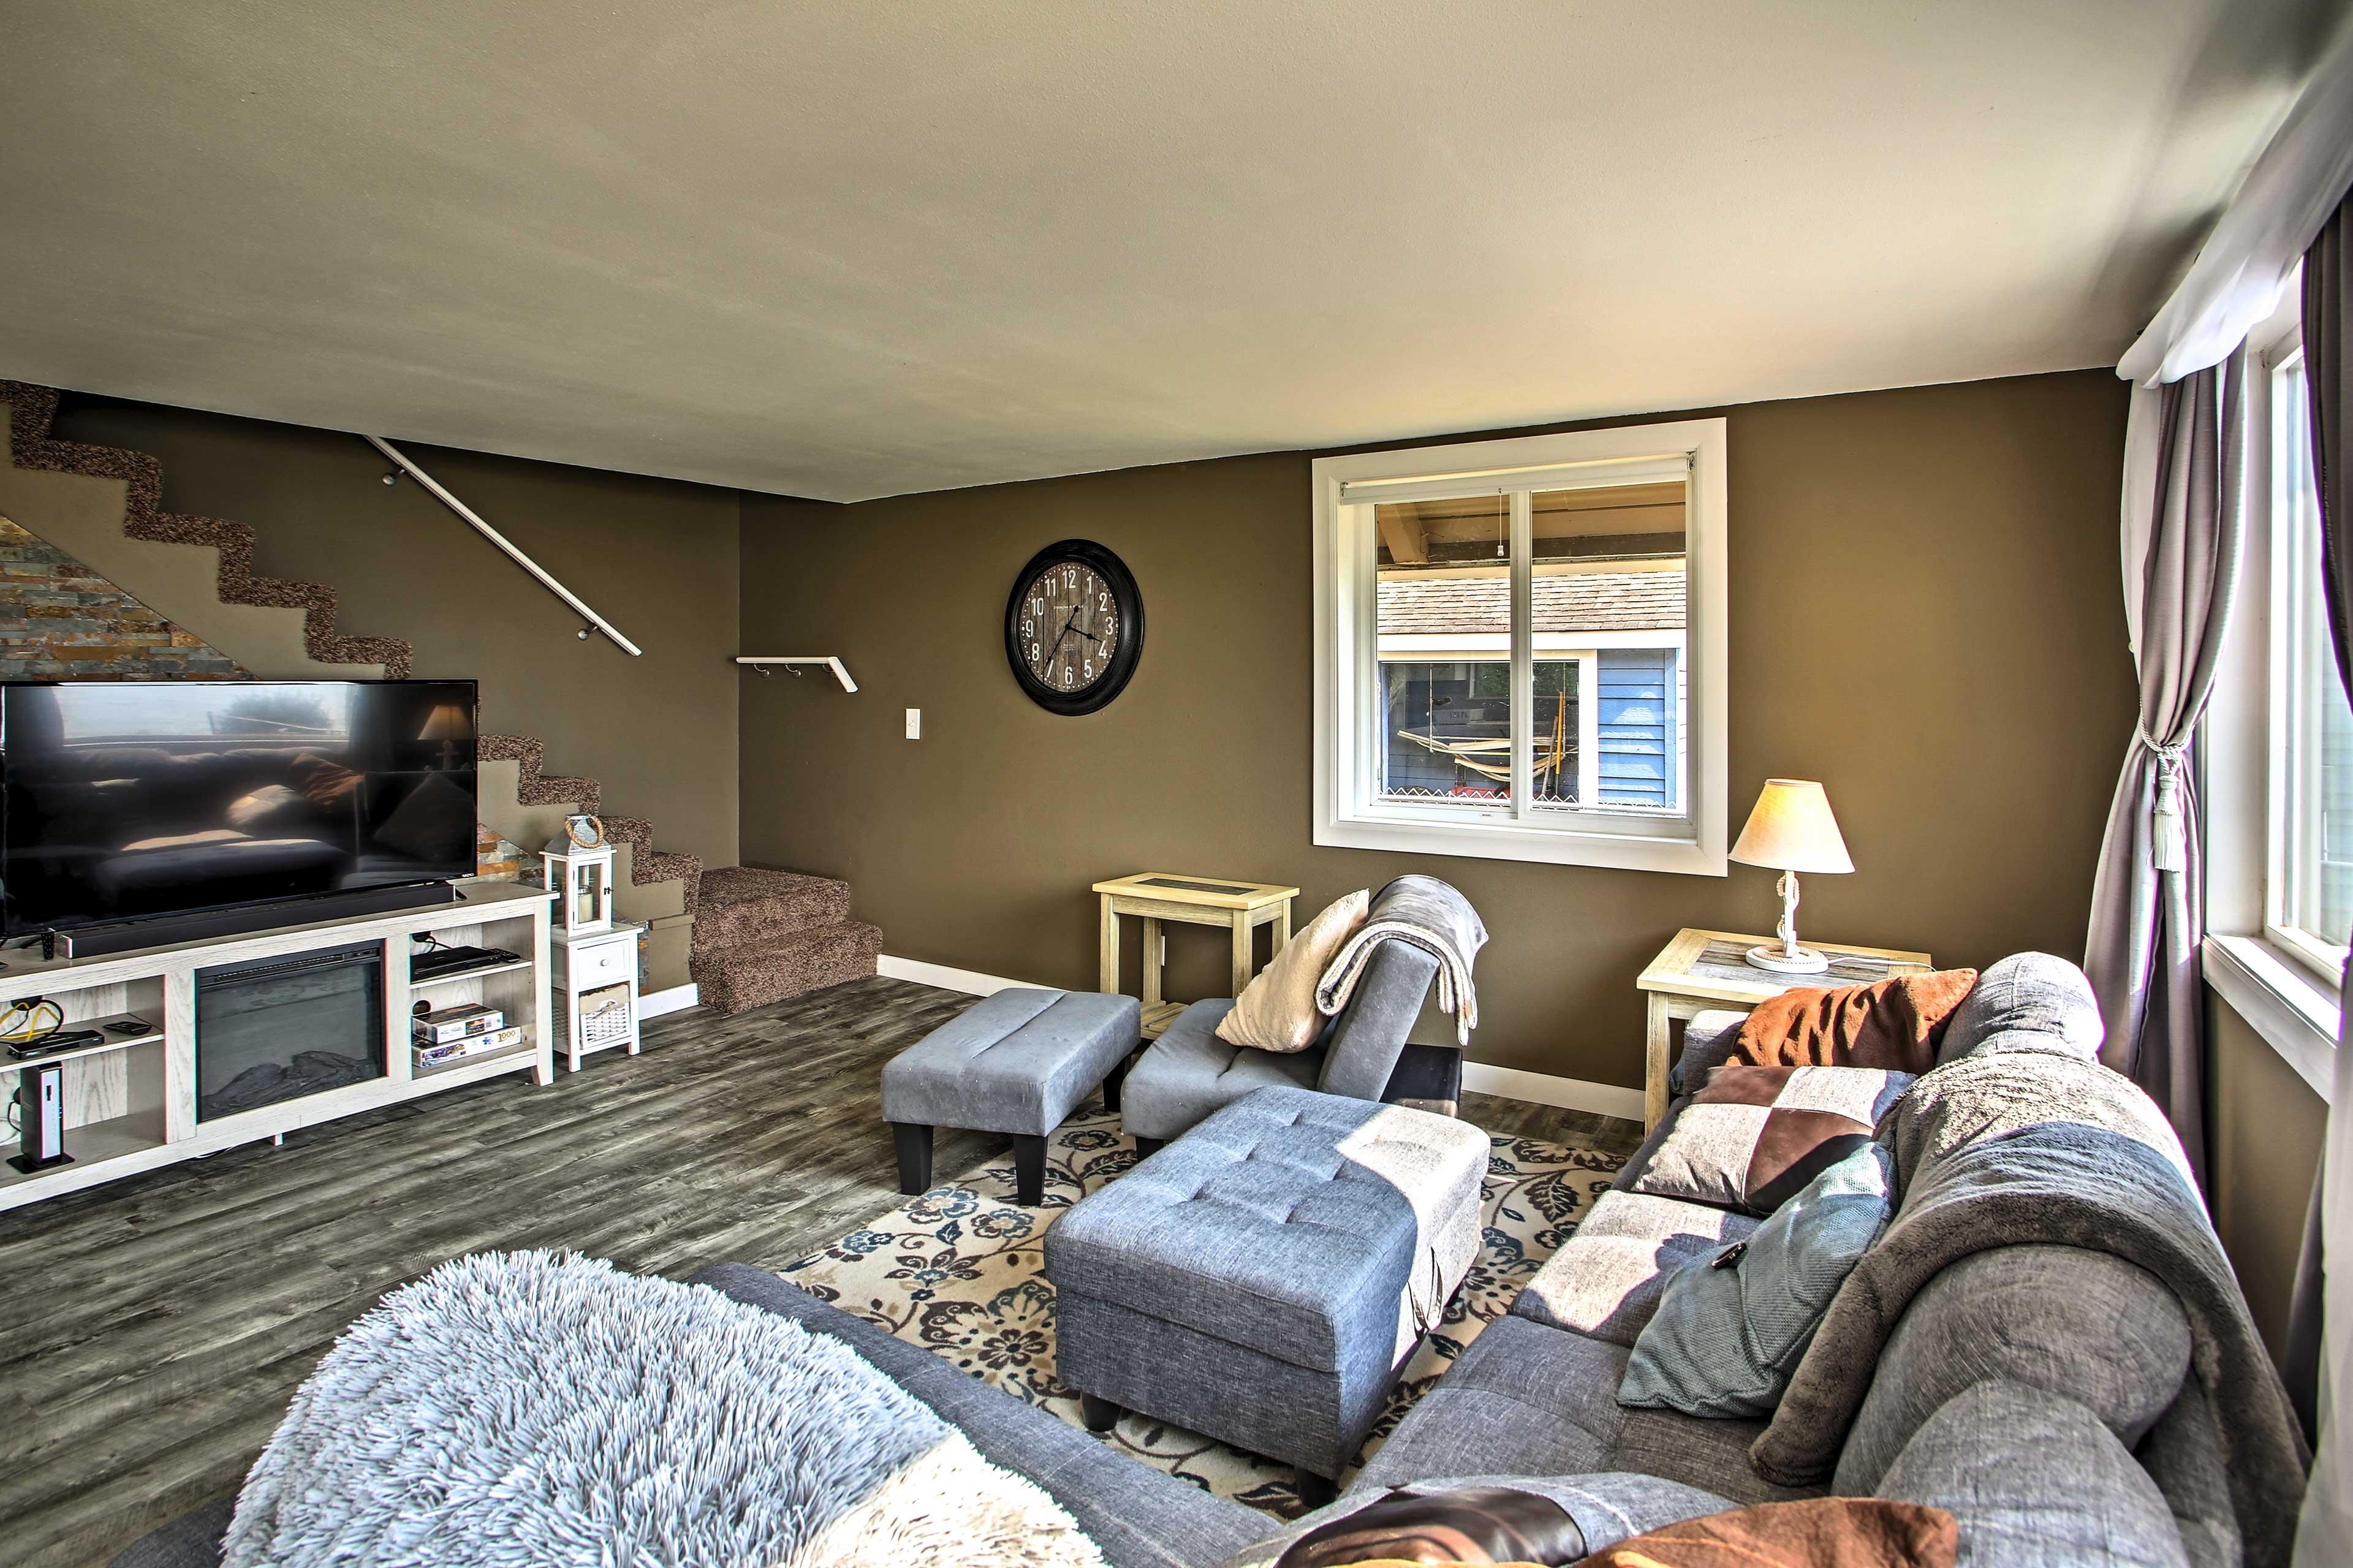 Living Room | Smart TV w/ Netflix & Amazon Prime | Electric Fireplace